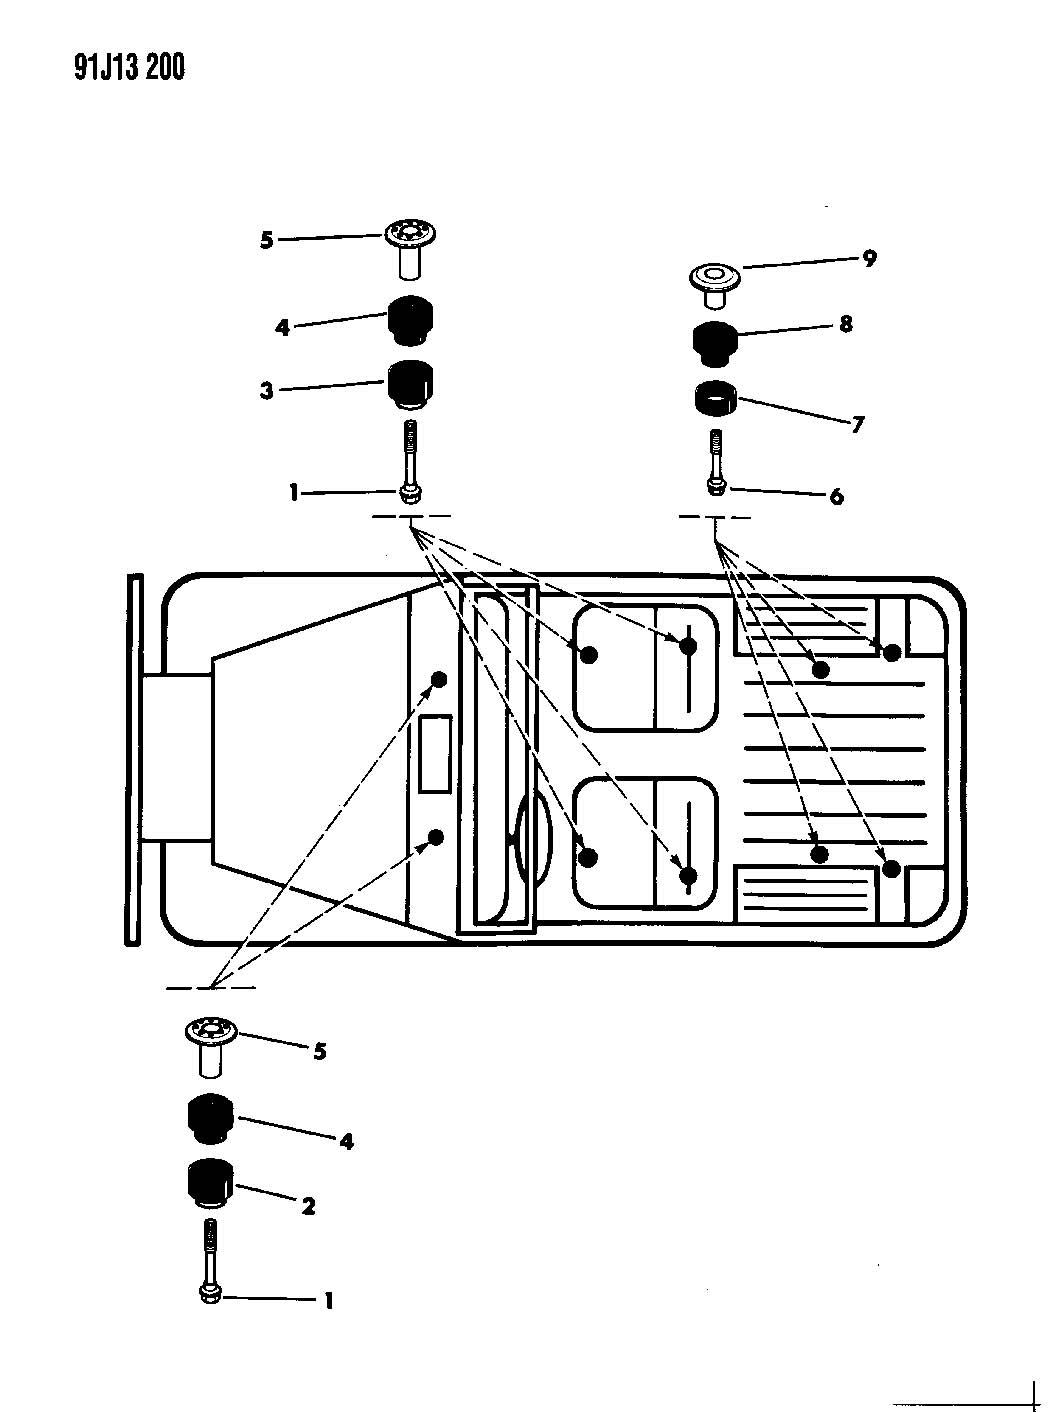 Mounting Hardware Body Wrangler Yj